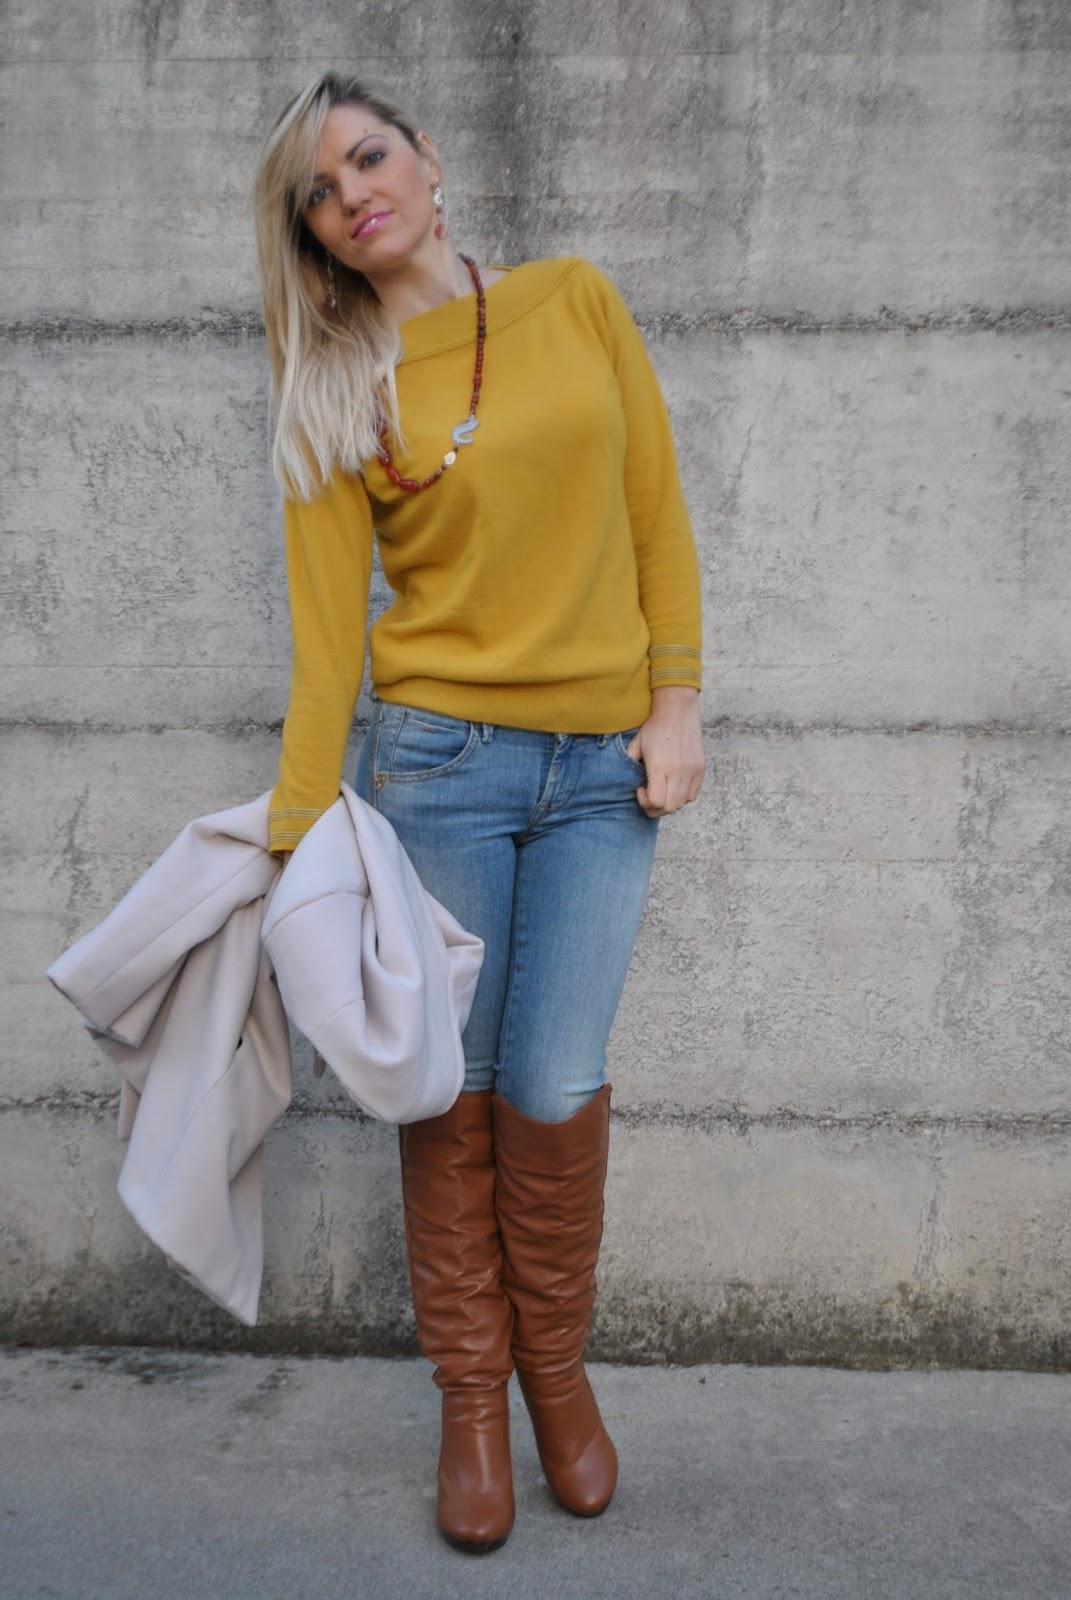 Come Abbinare Il Senape color-block by felym.: outfit: mustard sweater and skinny